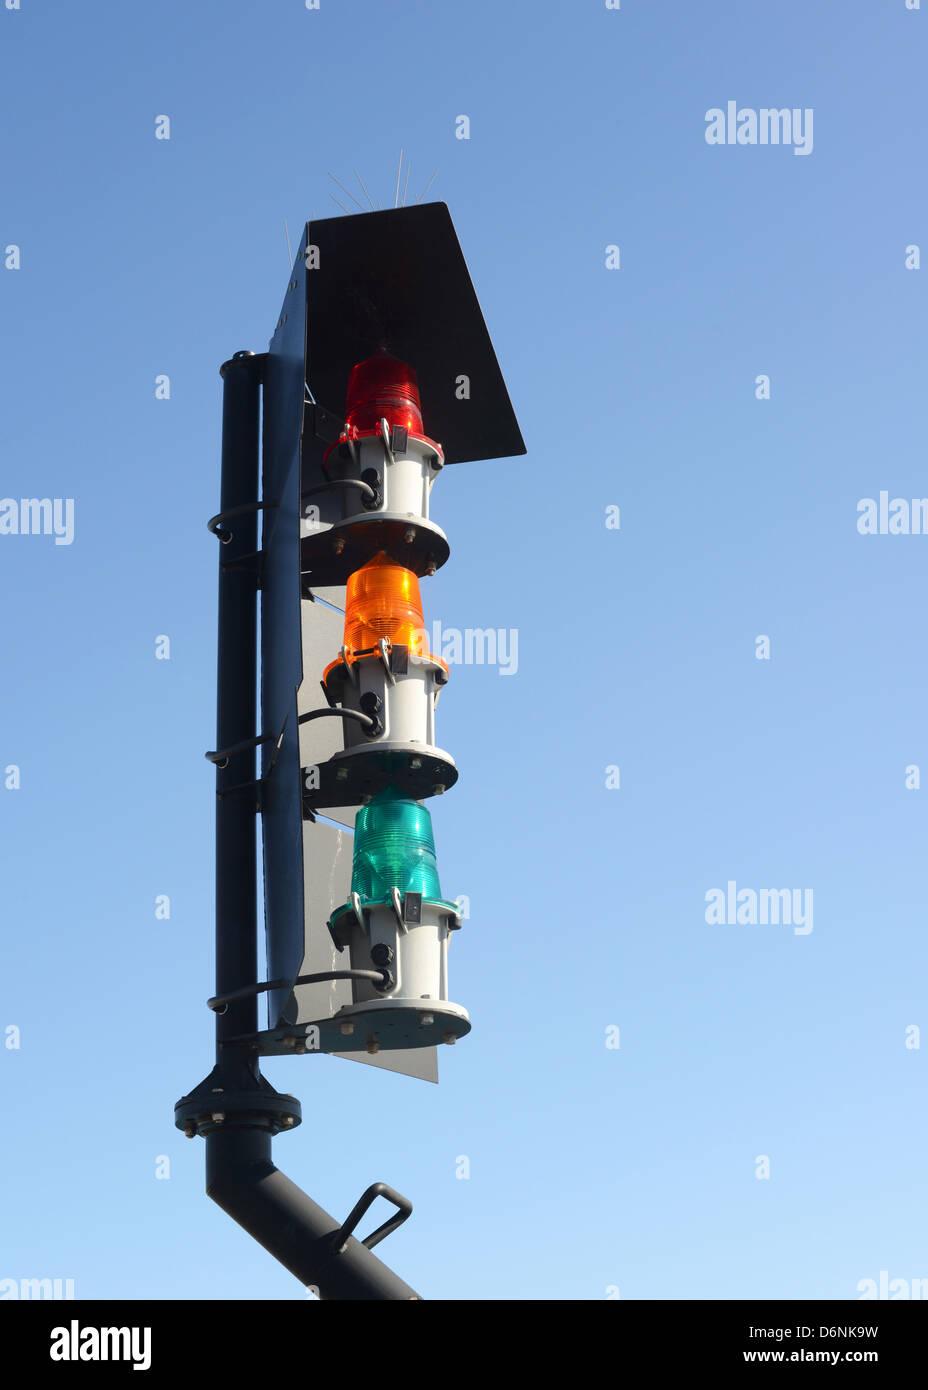 Harbour traffic lights - Stock Image